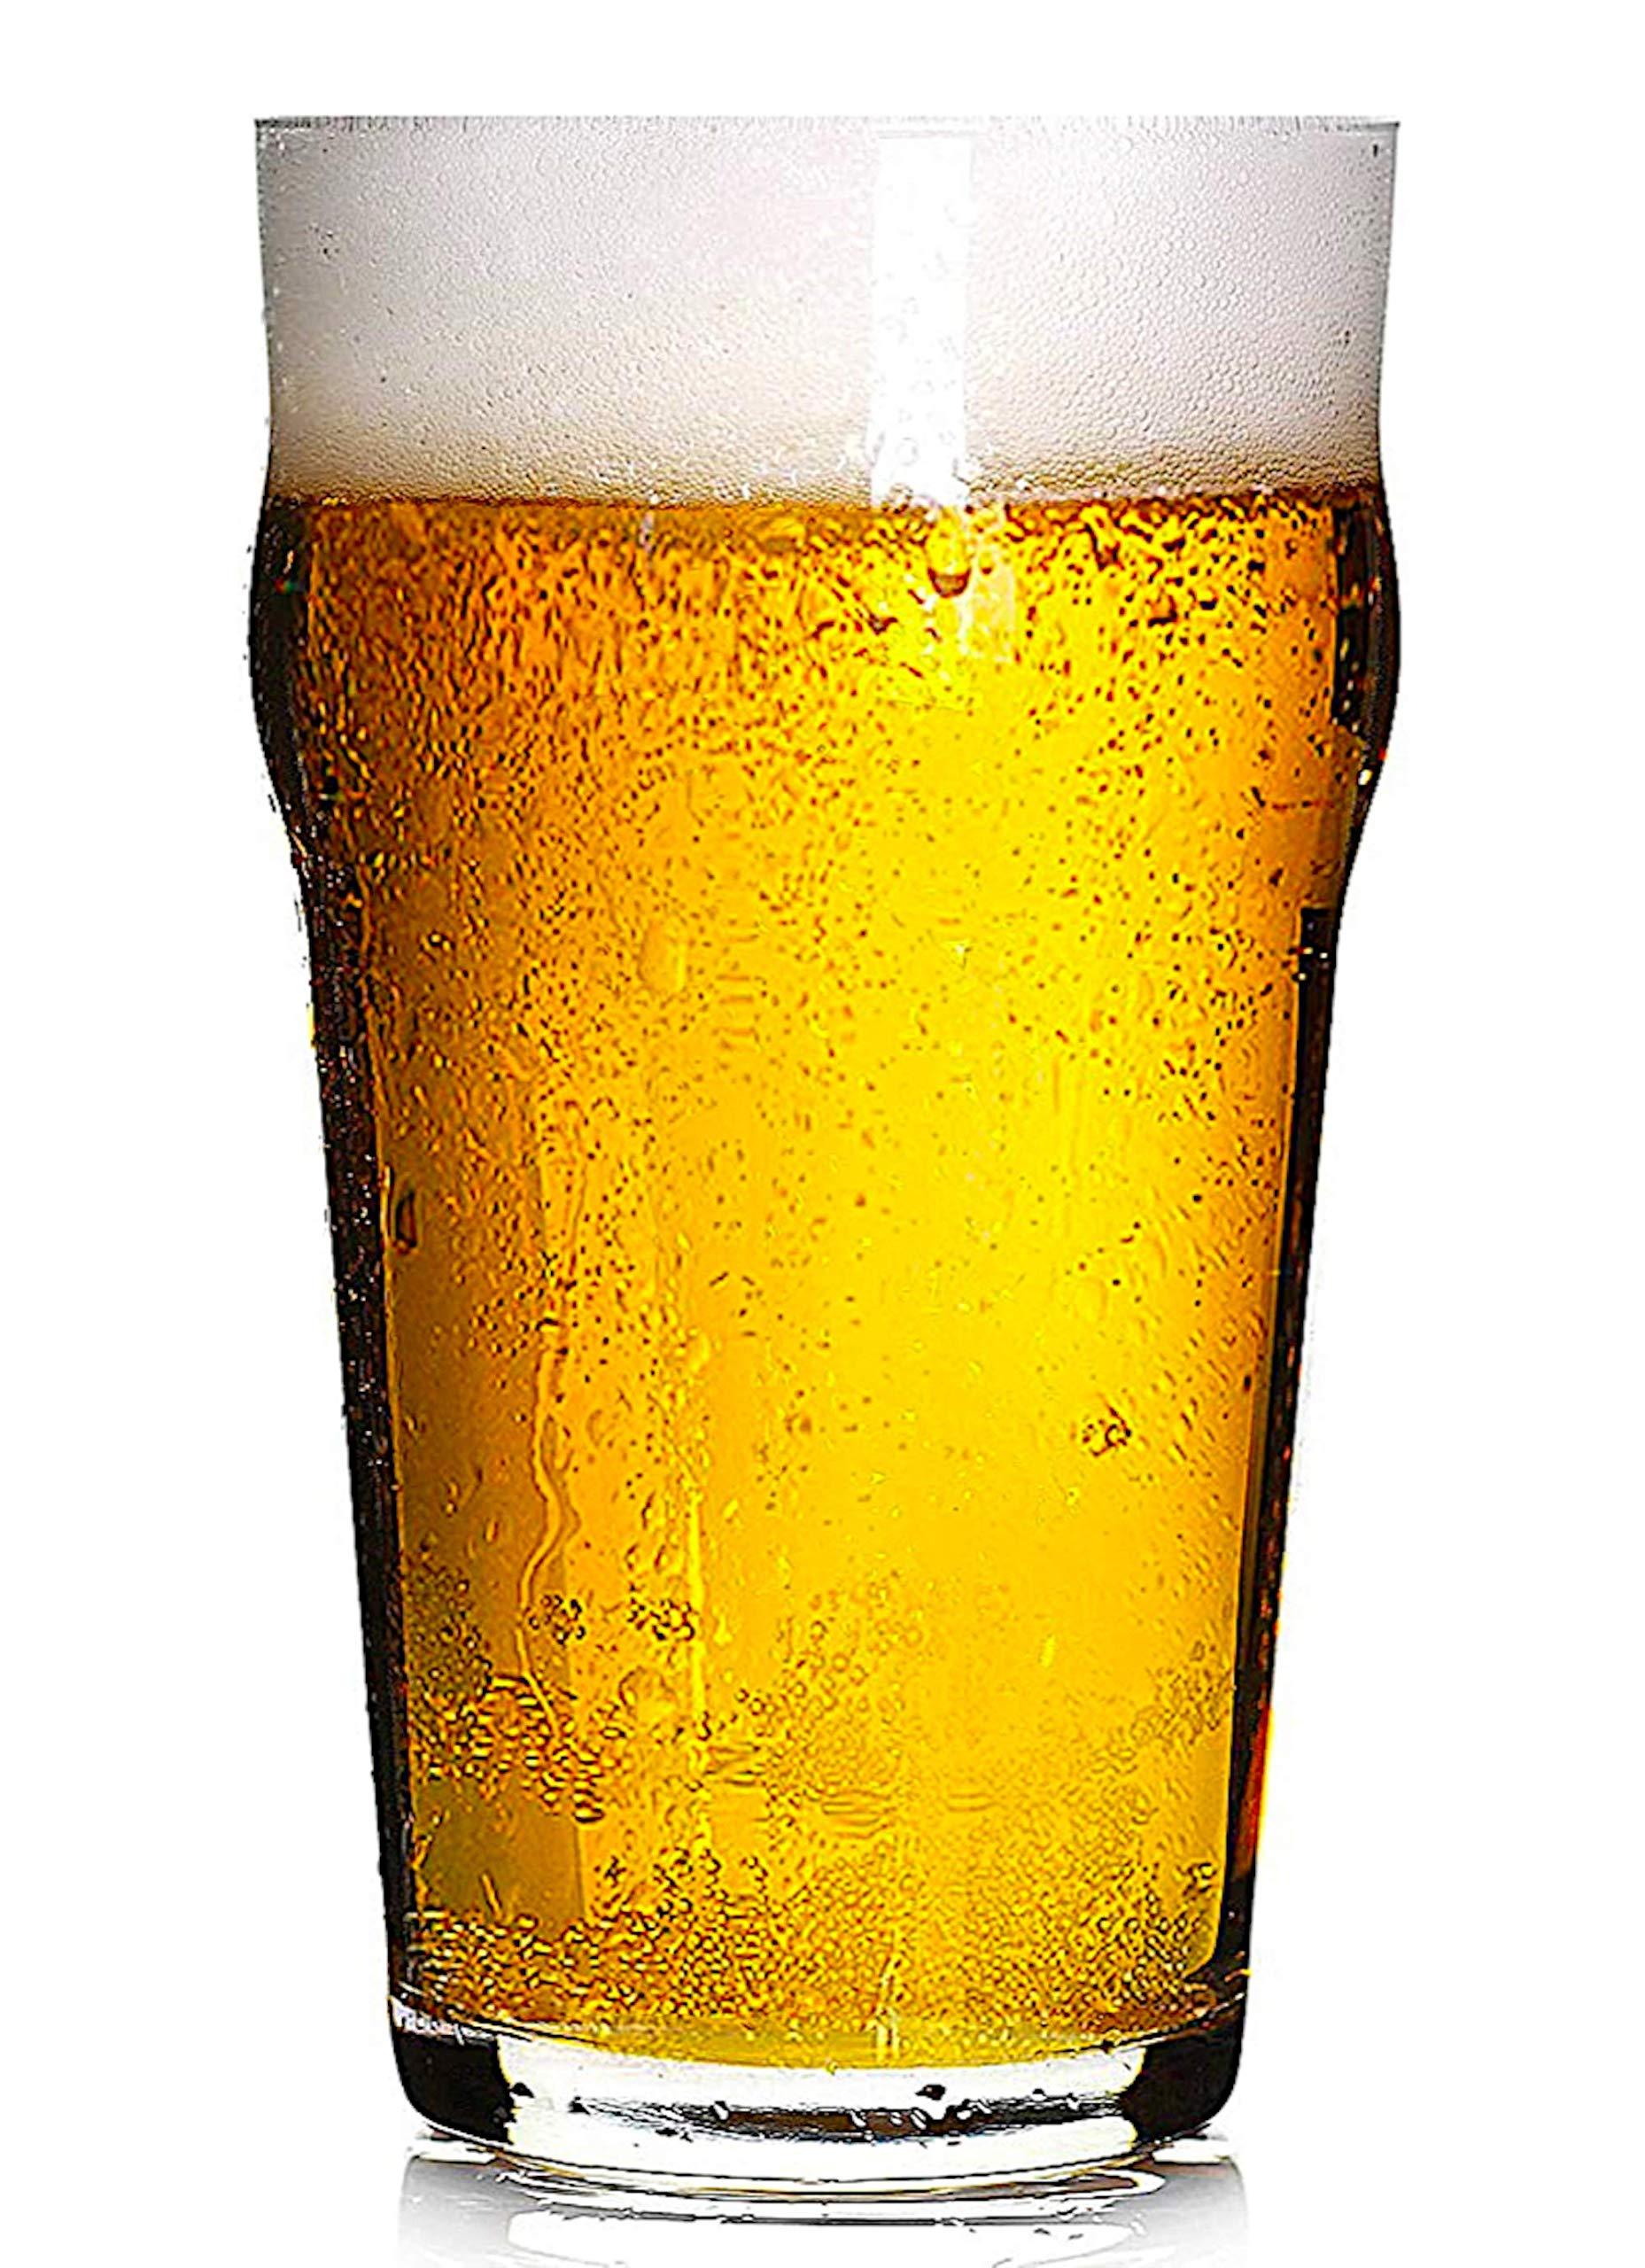 Hostelvia - Nonic Vaso de Cerveza de Pinta 56 cl - Pack de 12: Amazon.es: Hogar